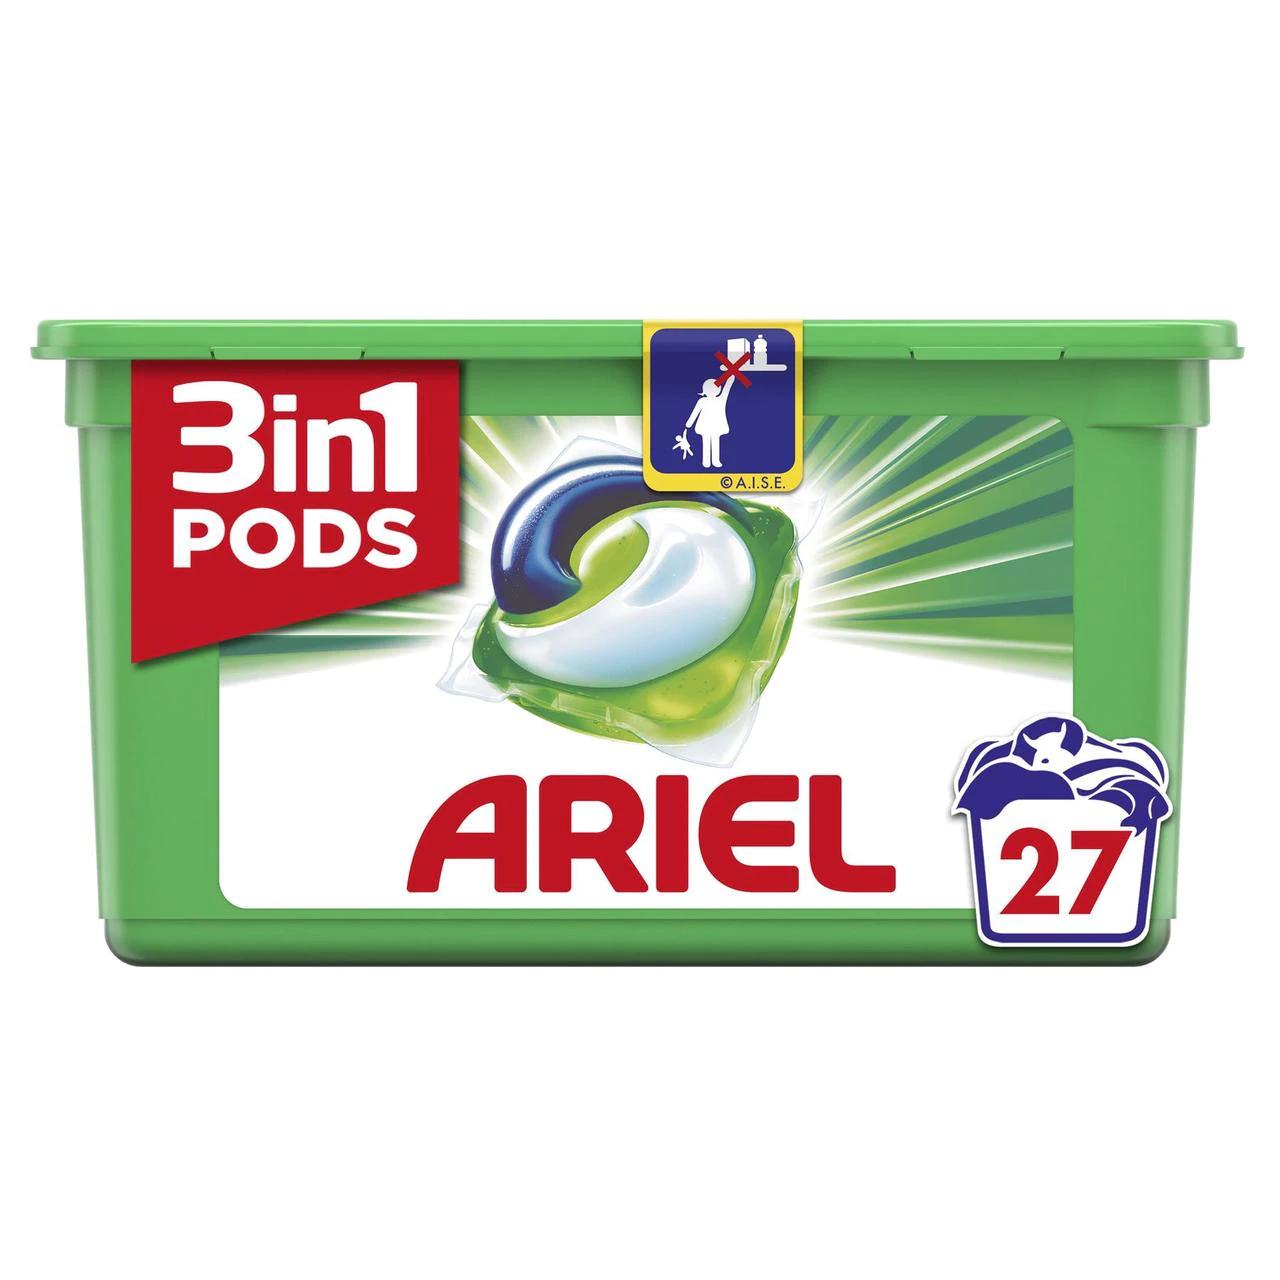 Tesco Arial 3 in 1 pod 27 washes - £3.50 instore @ Tesco, Stevenage